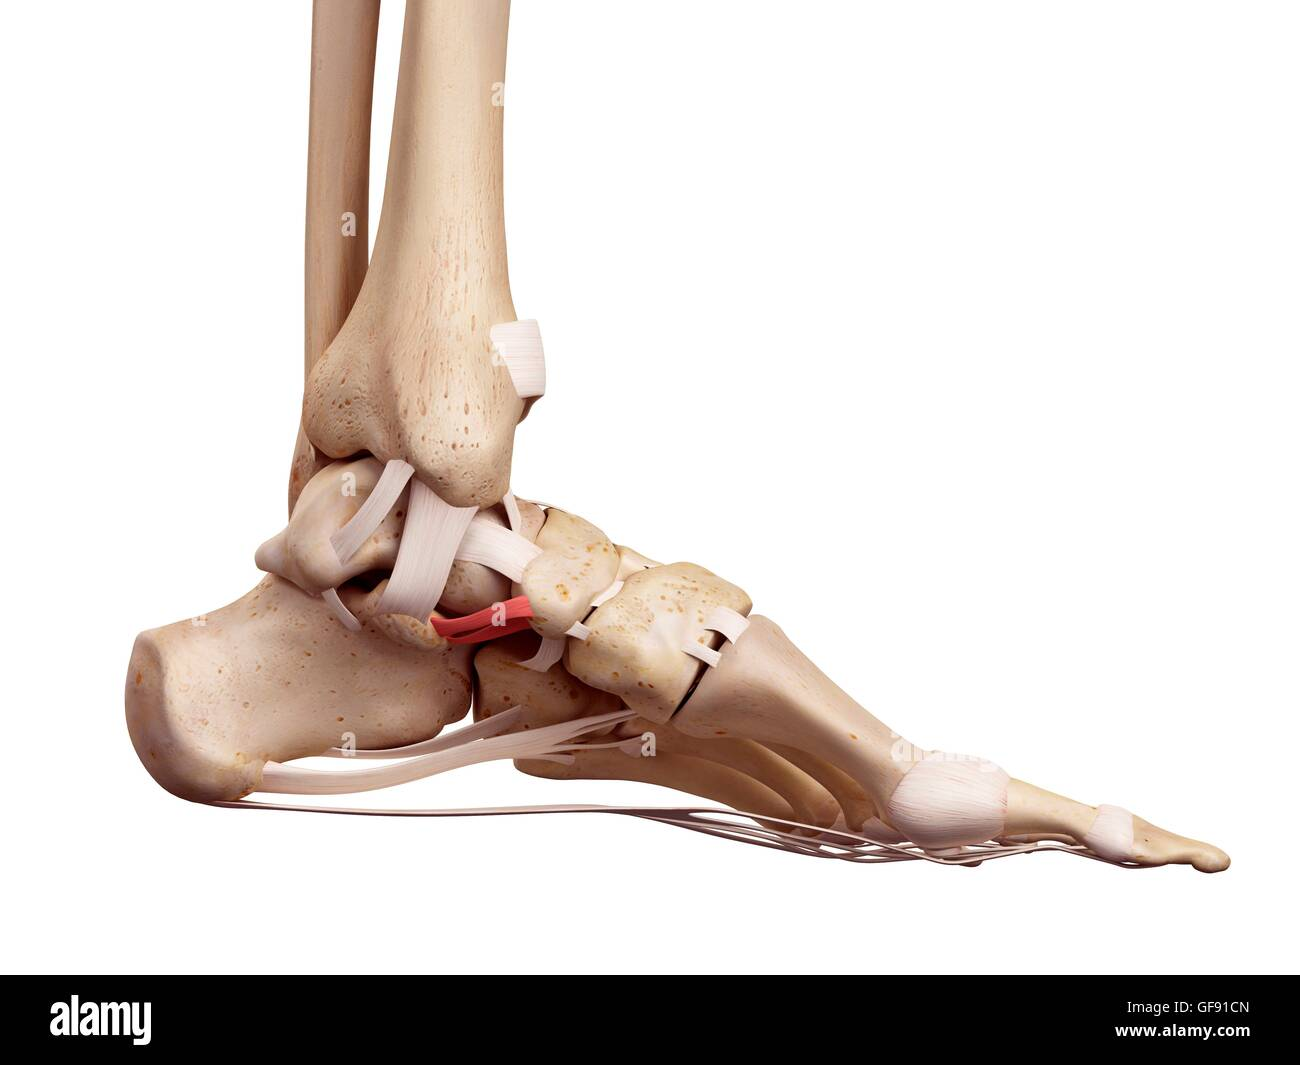 Foot Anatomy 3d Stockfotos & Foot Anatomy 3d Bilder - Alamy